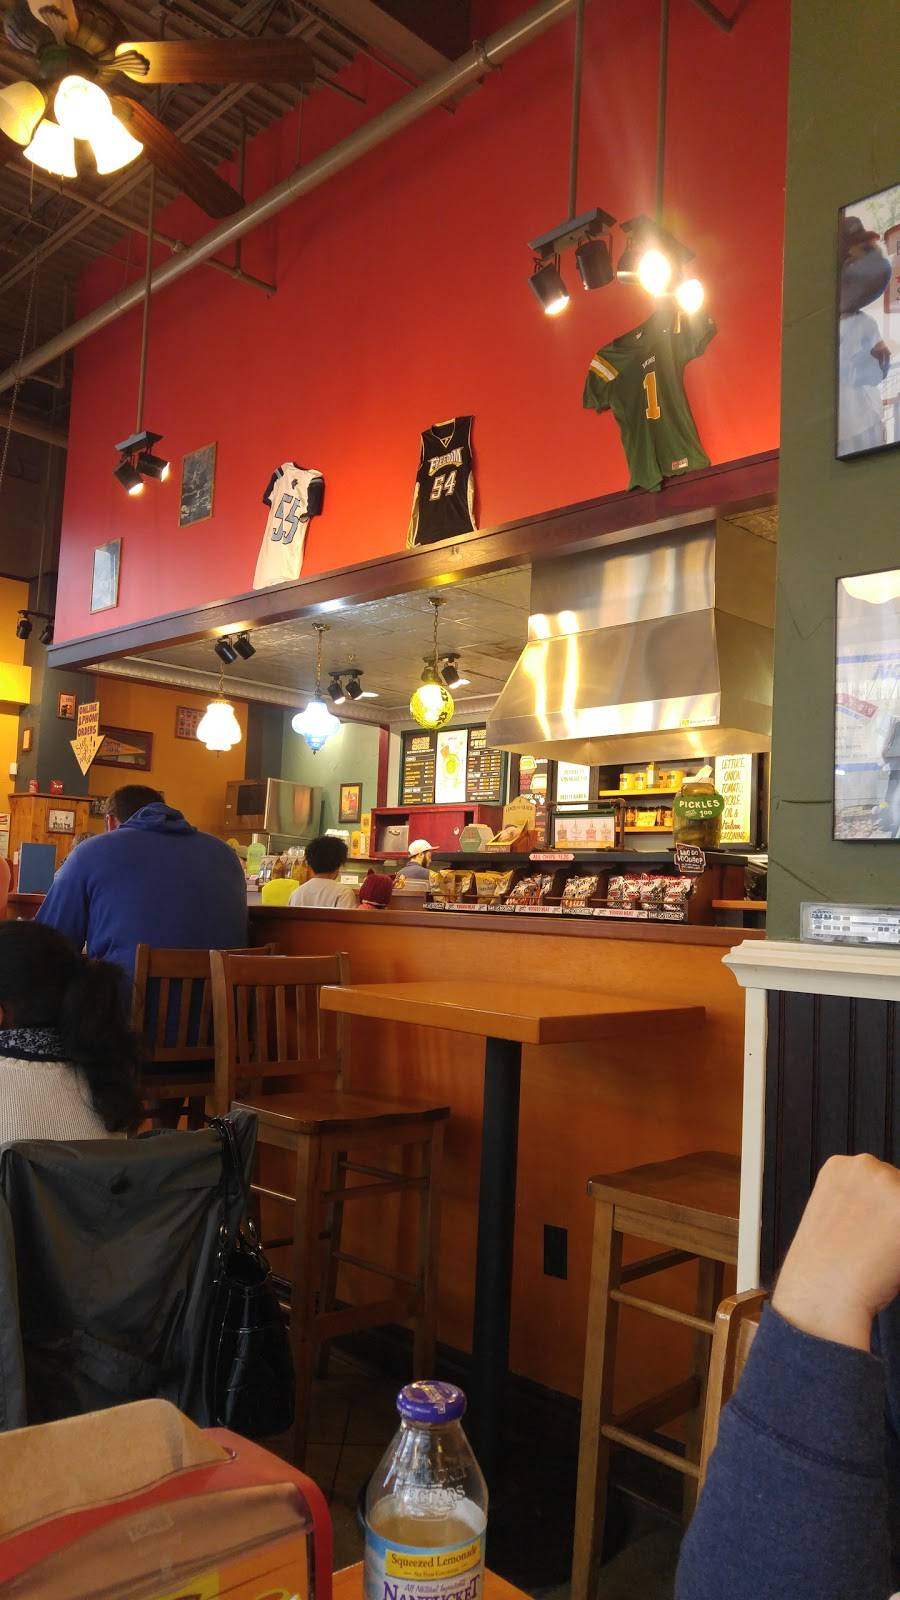 Potbelly Sandwich Shop | restaurant | 15000 Potomac Town Pl, Woodbridge, VA 22191, USA | 7039863395 OR +1 703-986-3395